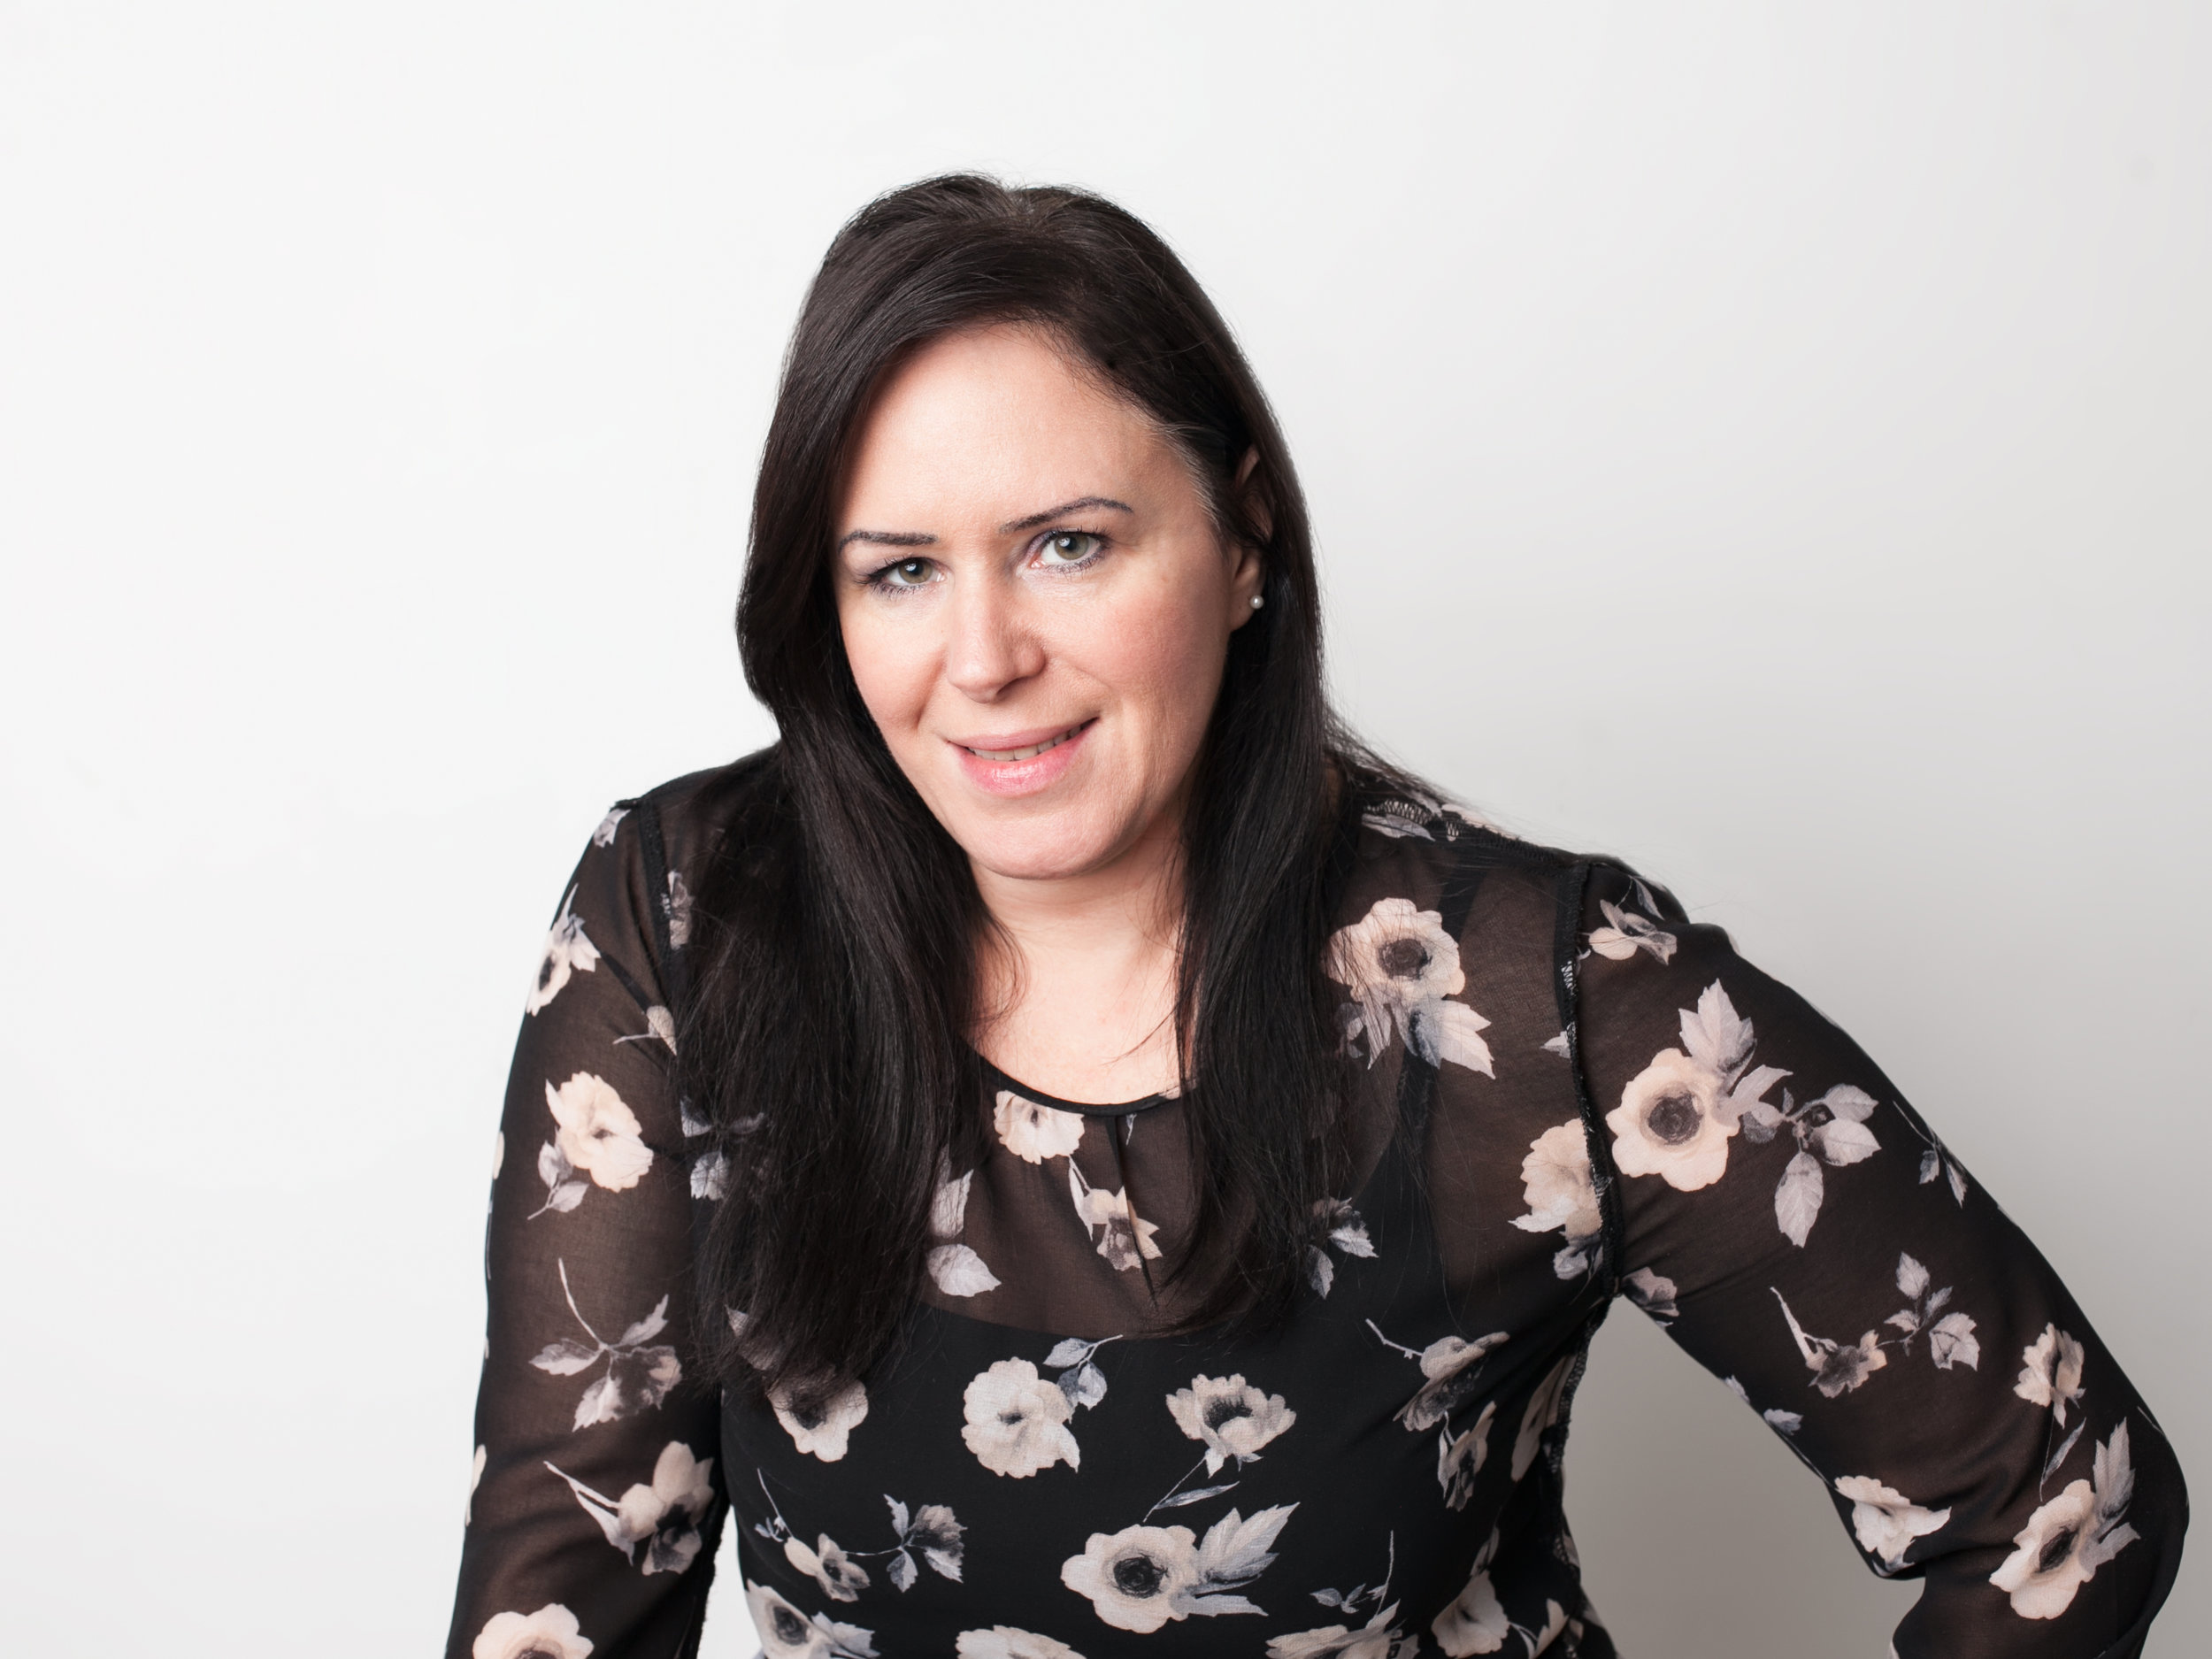 Melanie Guibord | Actress in Spørre